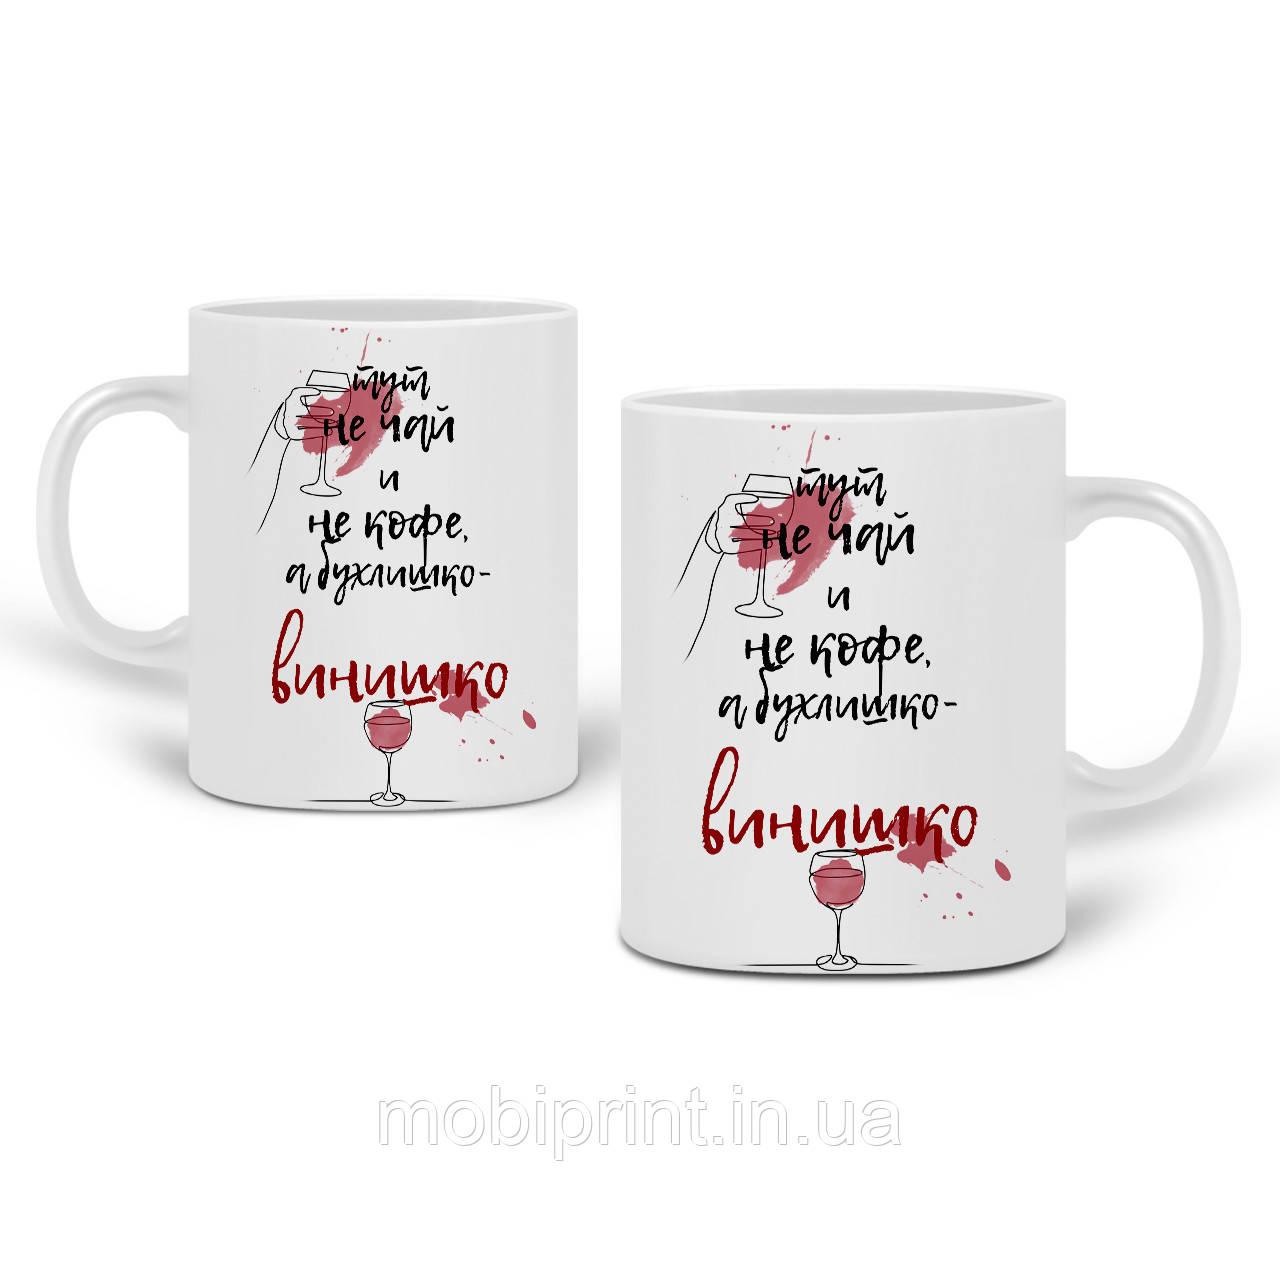 Кружка Тут не чай і не кава а винце 330 мл Чашка Керамічна (20259-2614)